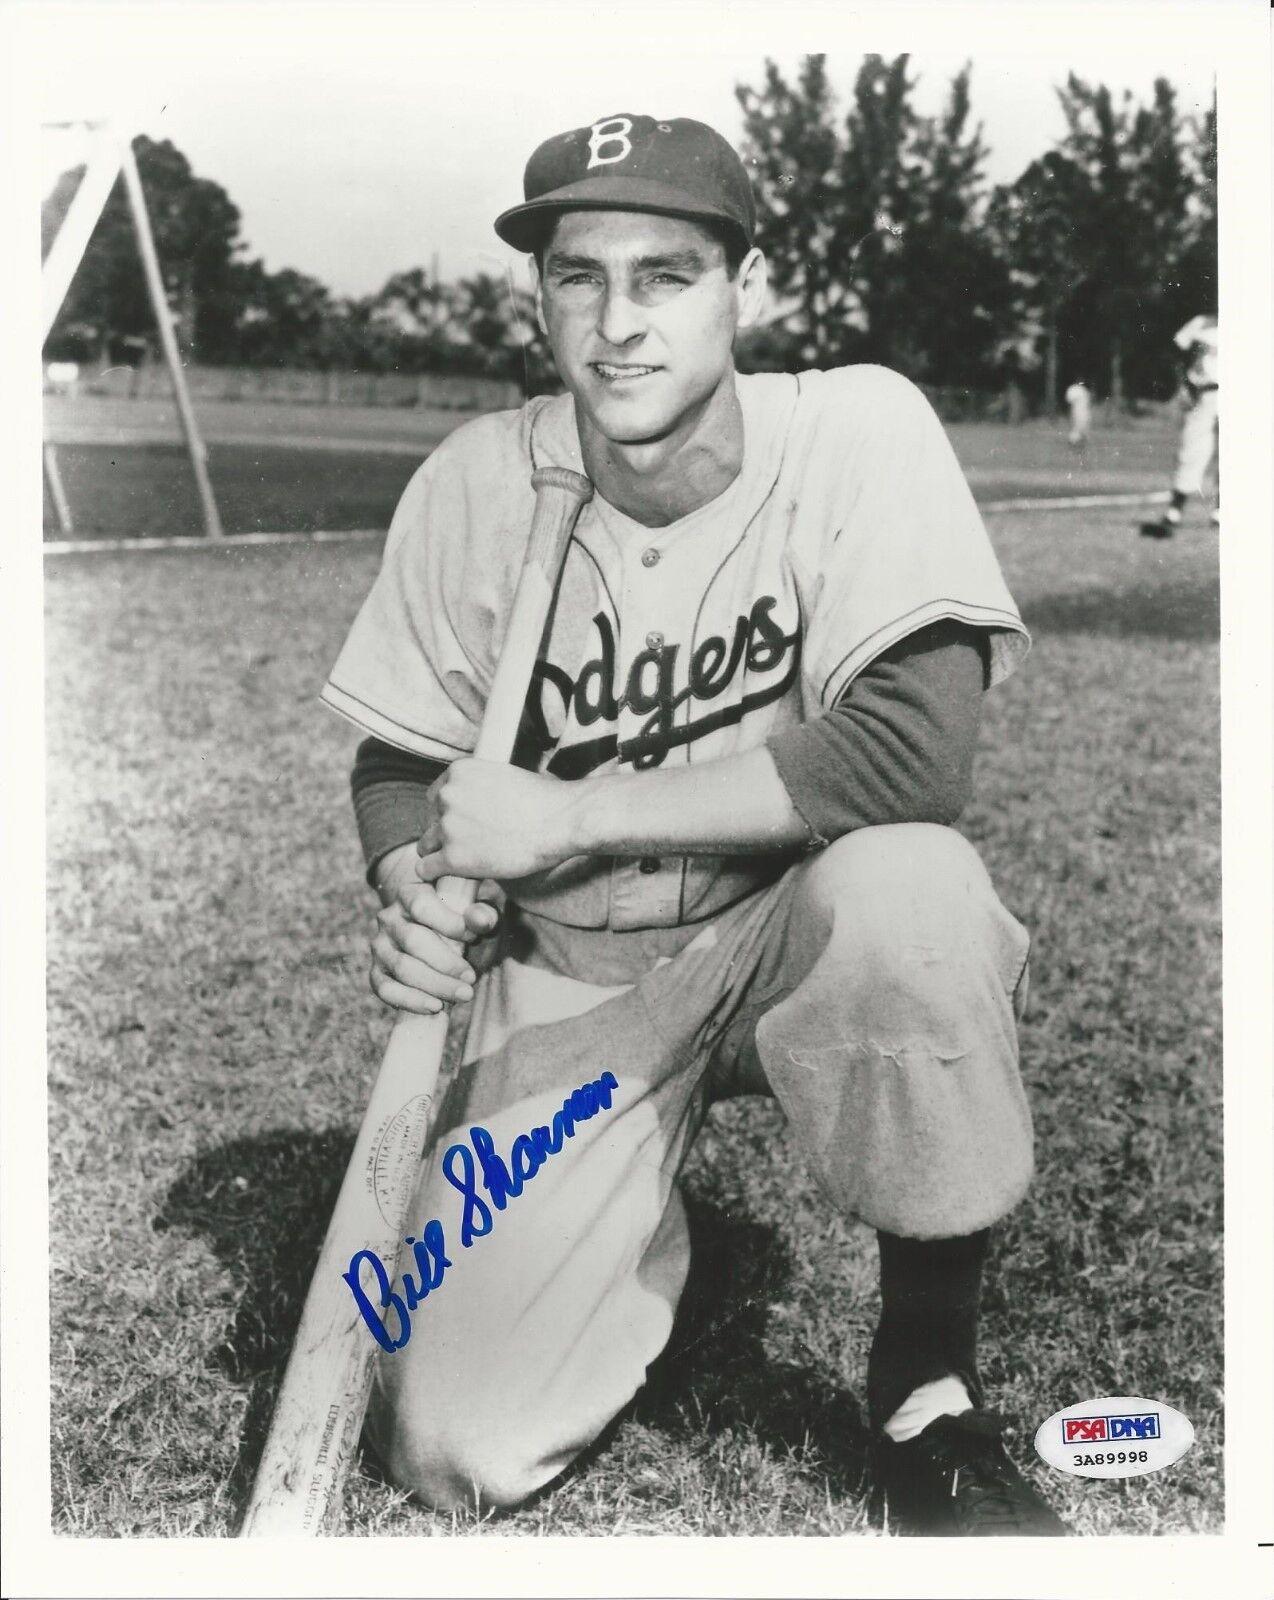 Bill Sharman LA Dodgers Signed 8x10 Photo - PSA/DNA # 3A89998